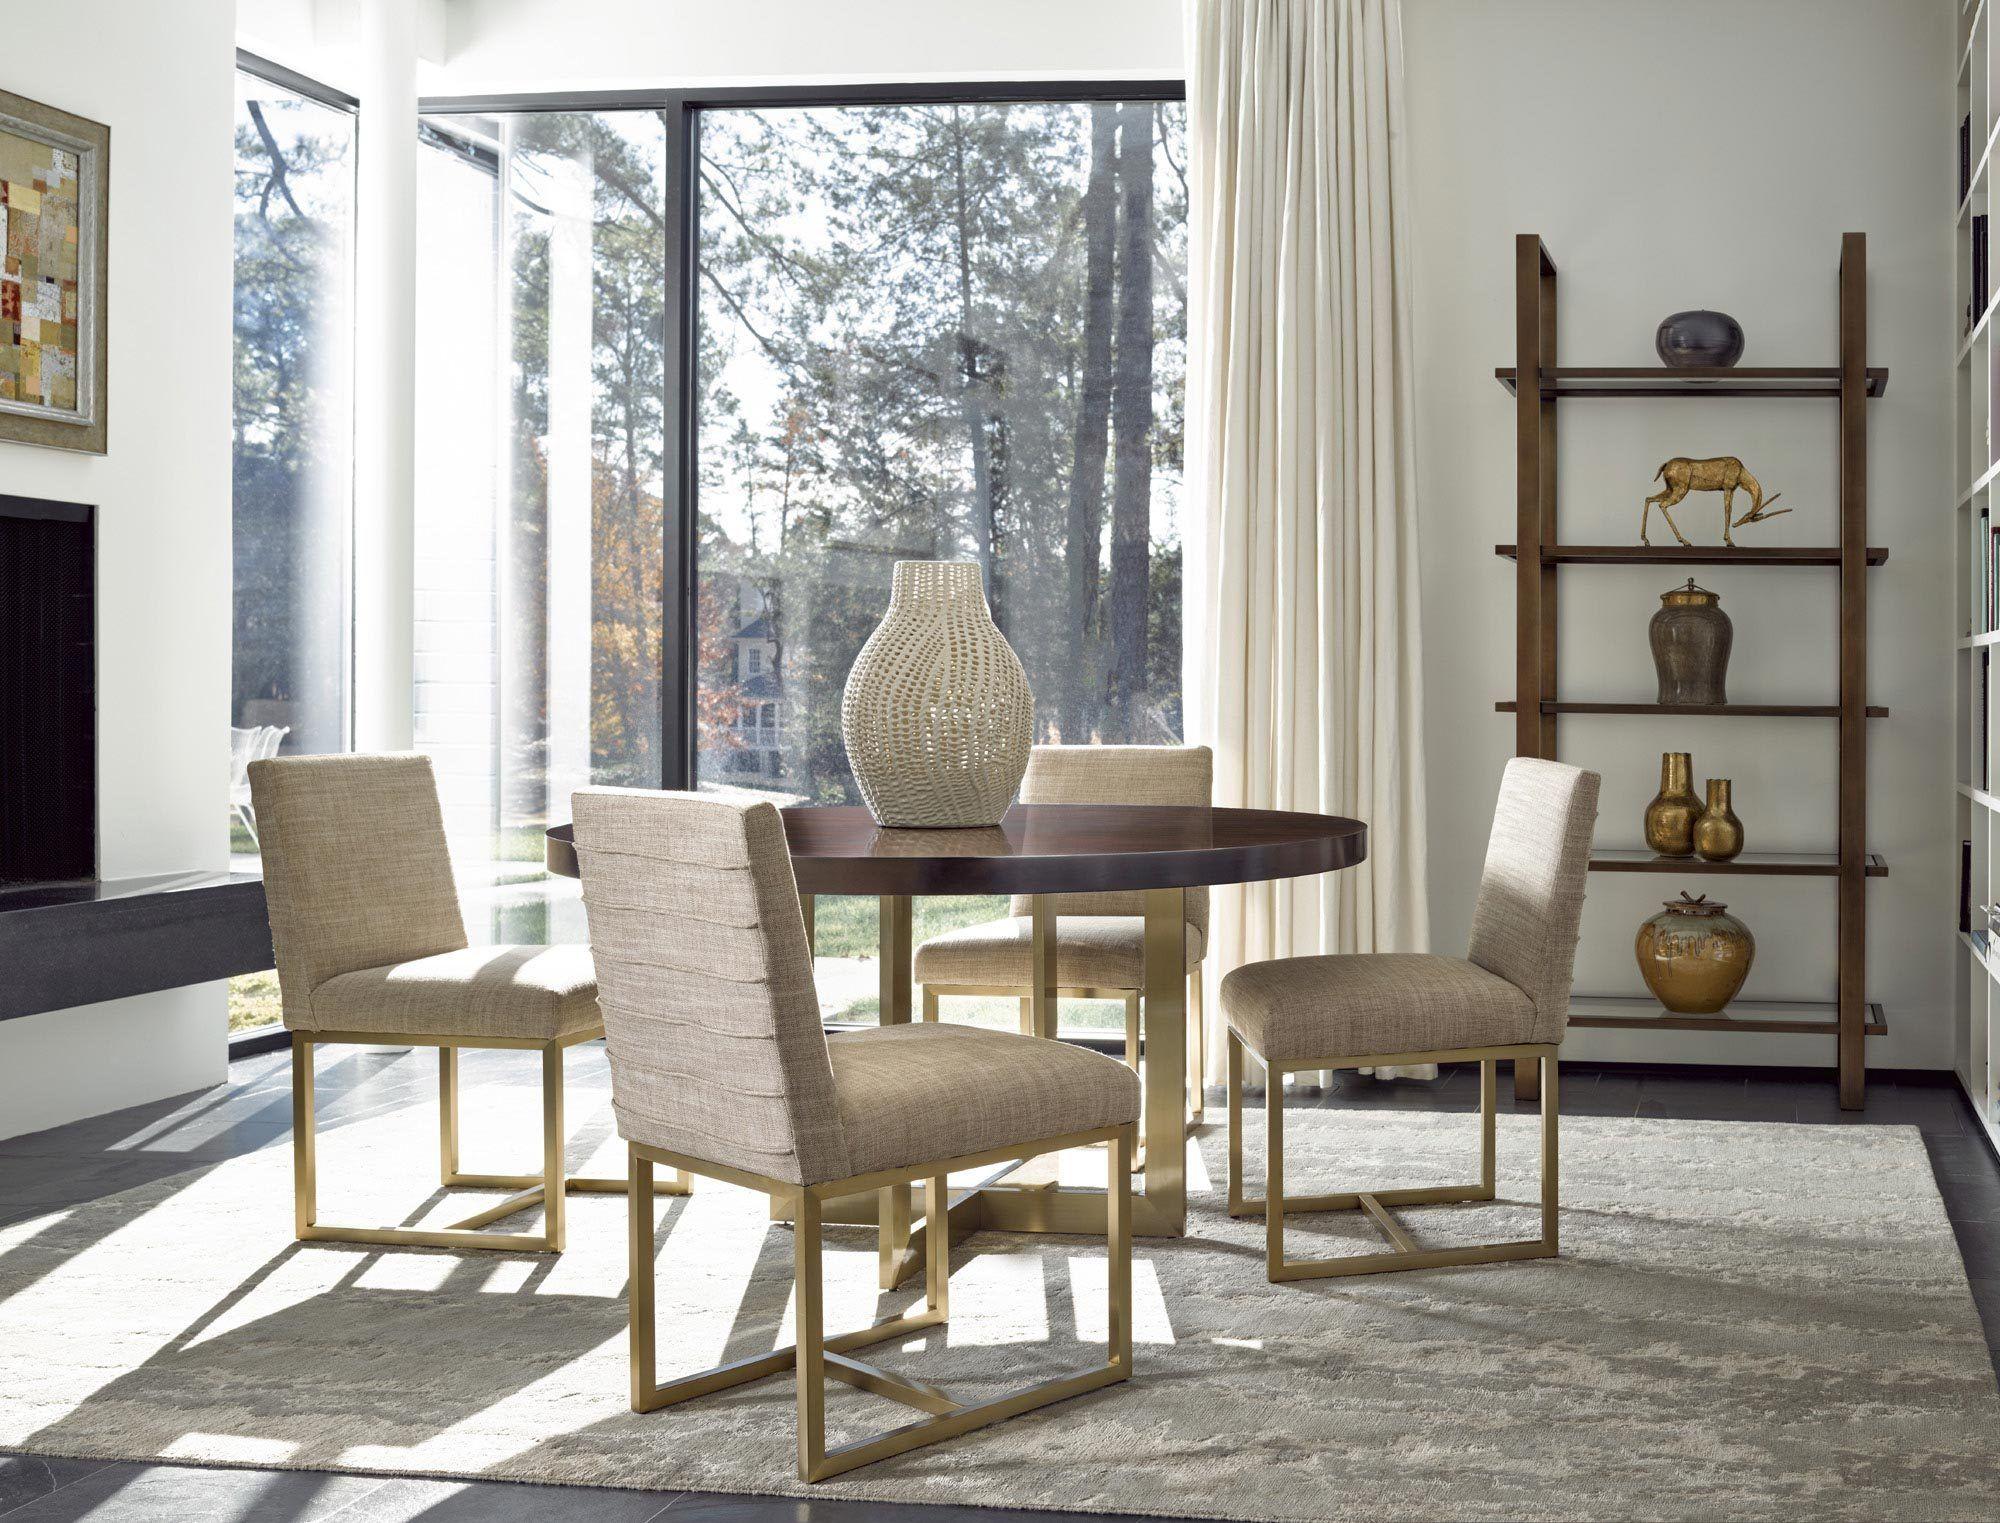 Modern Round Dining Room Set  Universal Furniture  Home Gallery Custom Universal Furniture Dining Room Set Inspiration Design